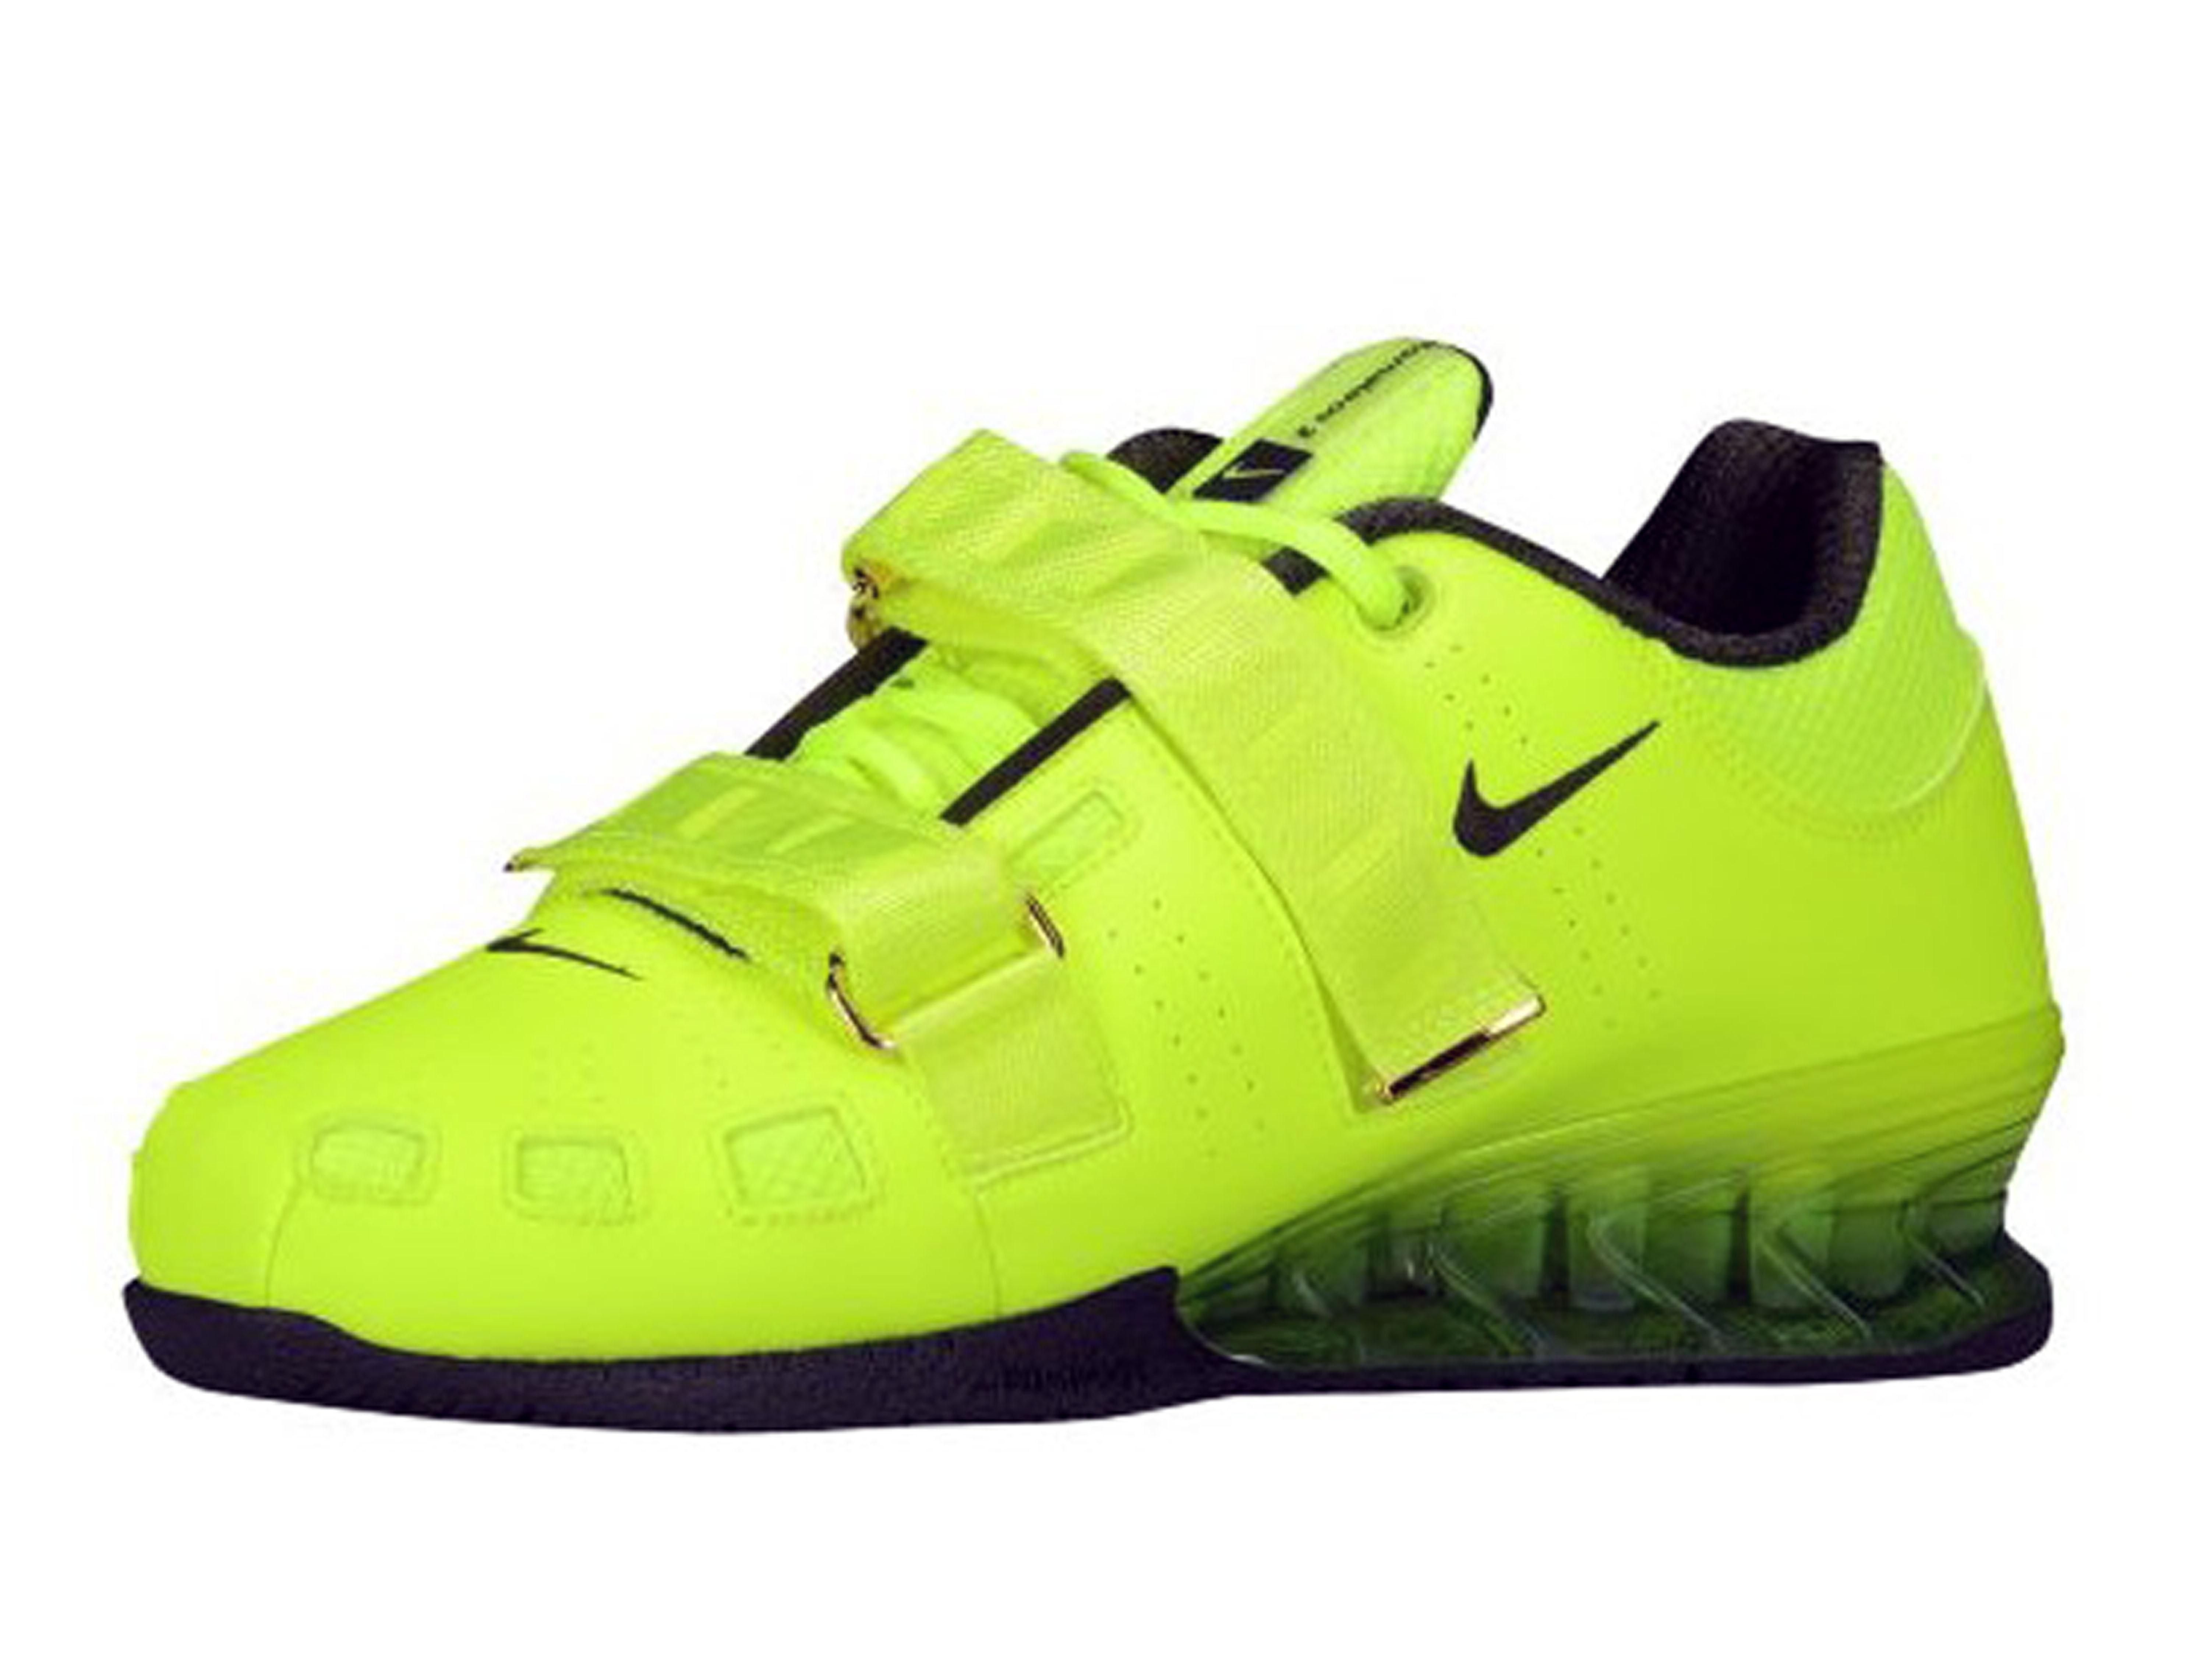 10. Nike Romaleos